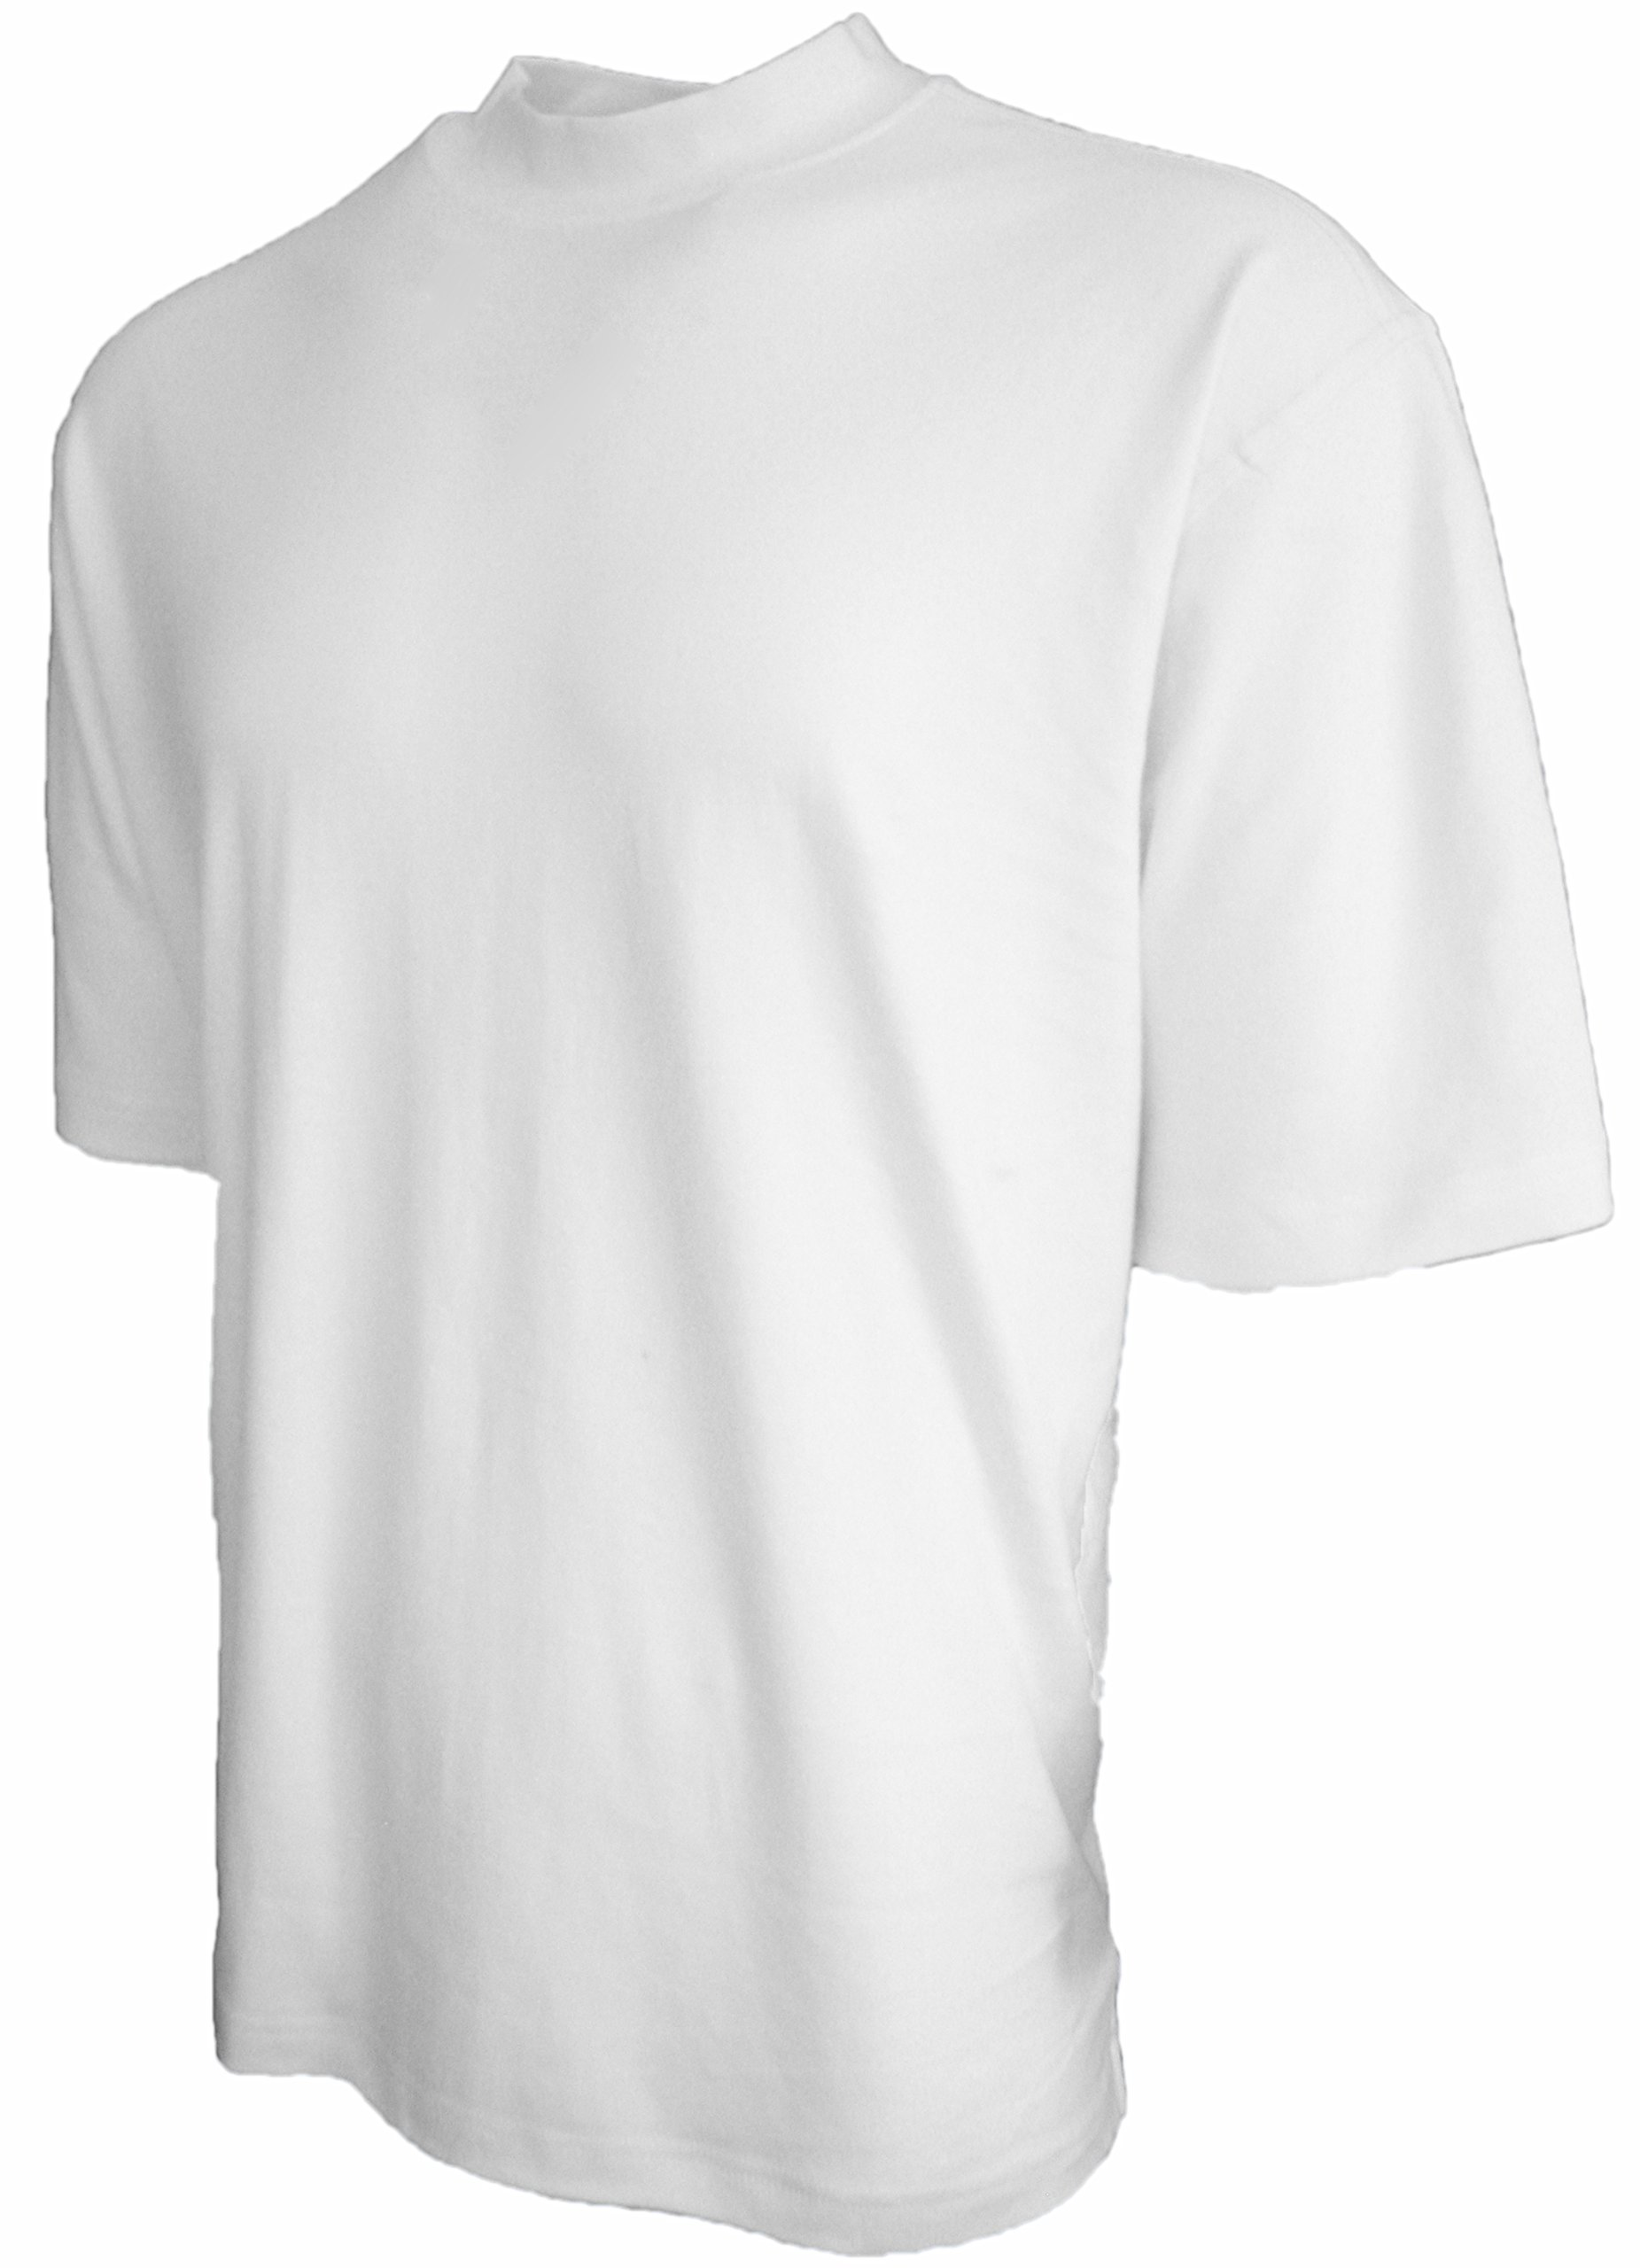 Good Life Mens Luxury Cotton Mock Neck Shirt Pre-Shrunk (Medium, White)